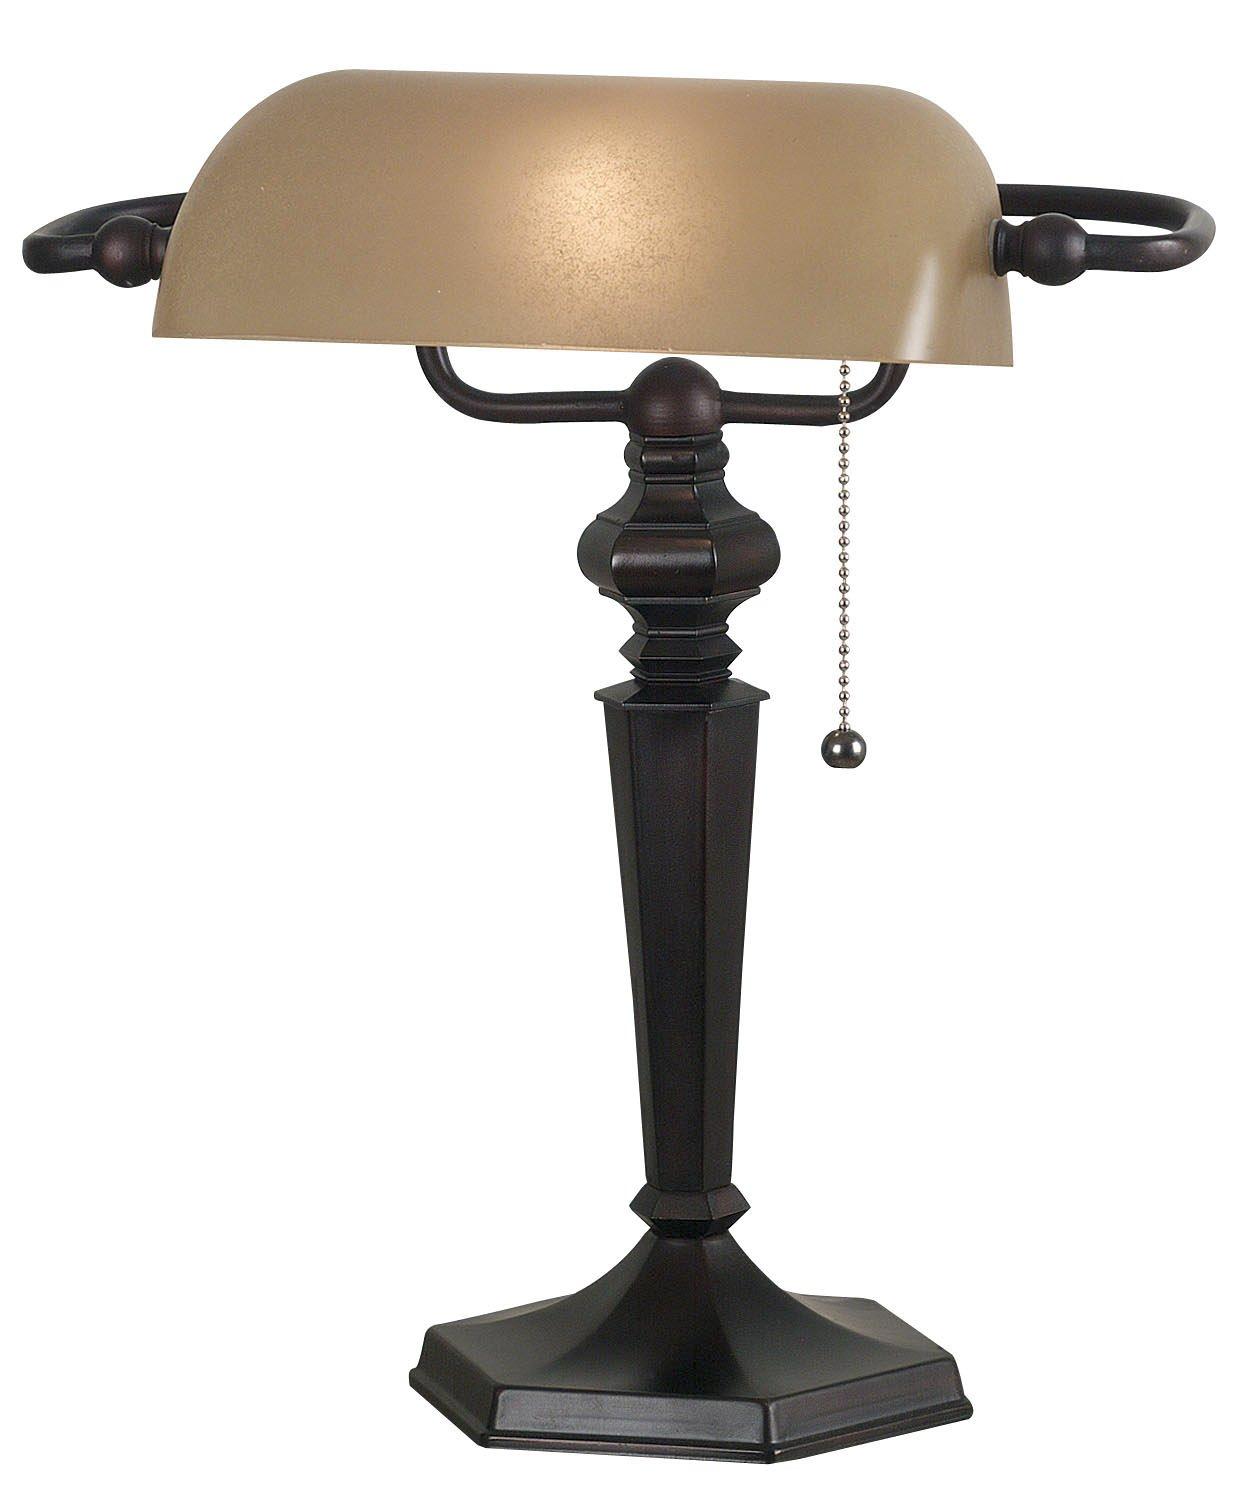 Kenroy Home 20610ORB Chesapeake Banker Lamp, Oil Rubbed Bronze by Kenroy Home